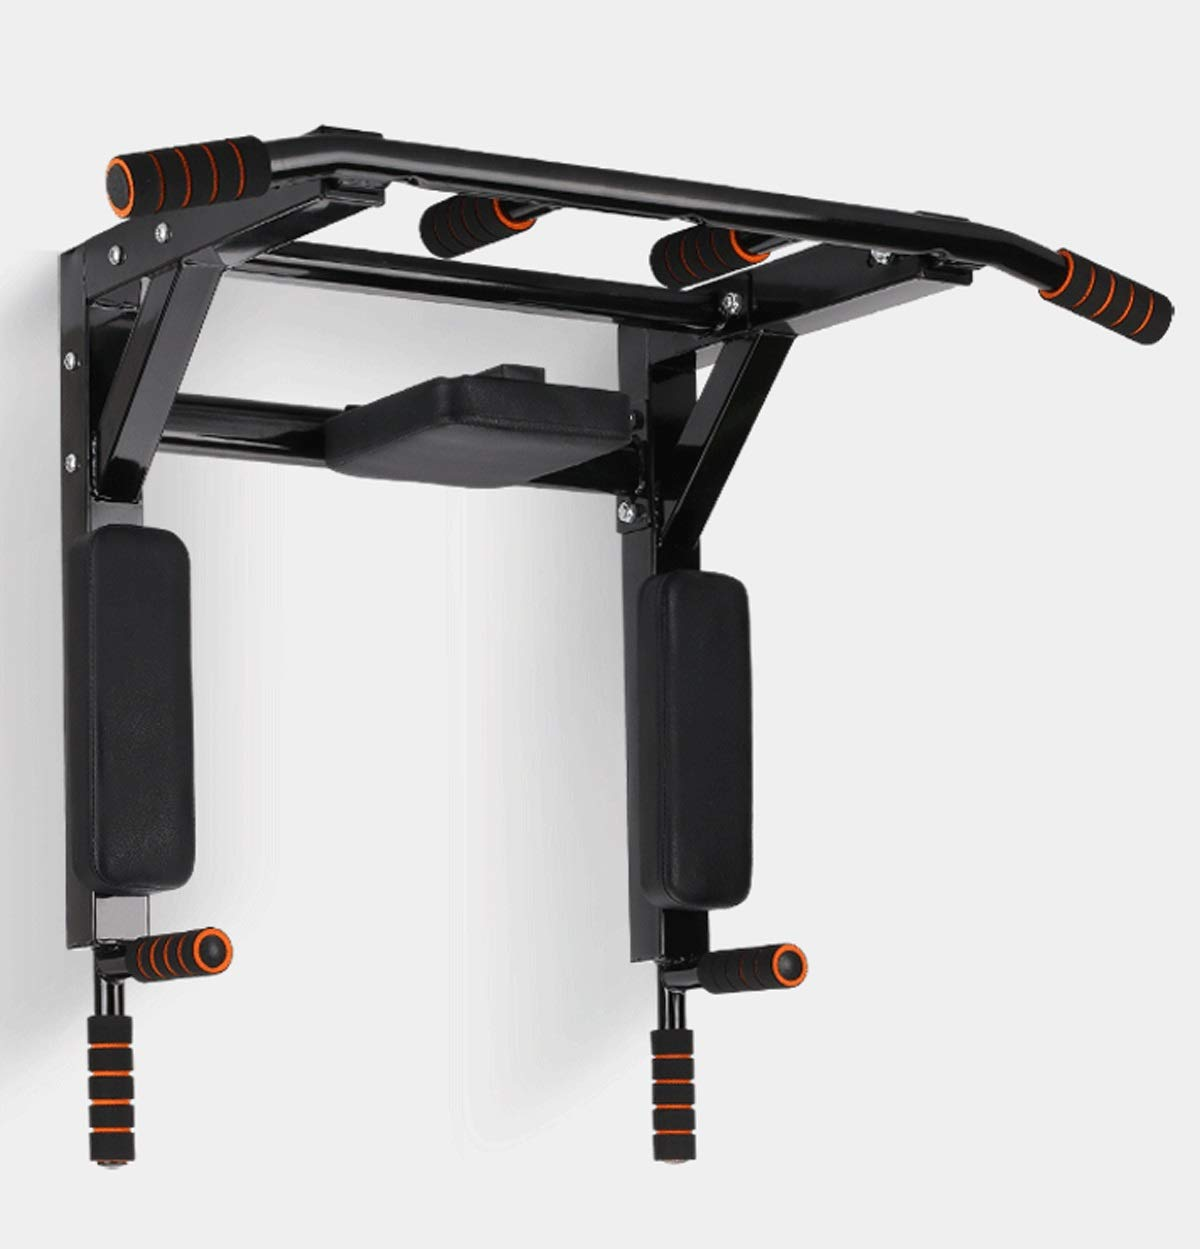 Pull-ups On The Wall, Horizontal Bars, Indoor Horizontal Bars, Parallel Bars, Detachable Sports Equipment